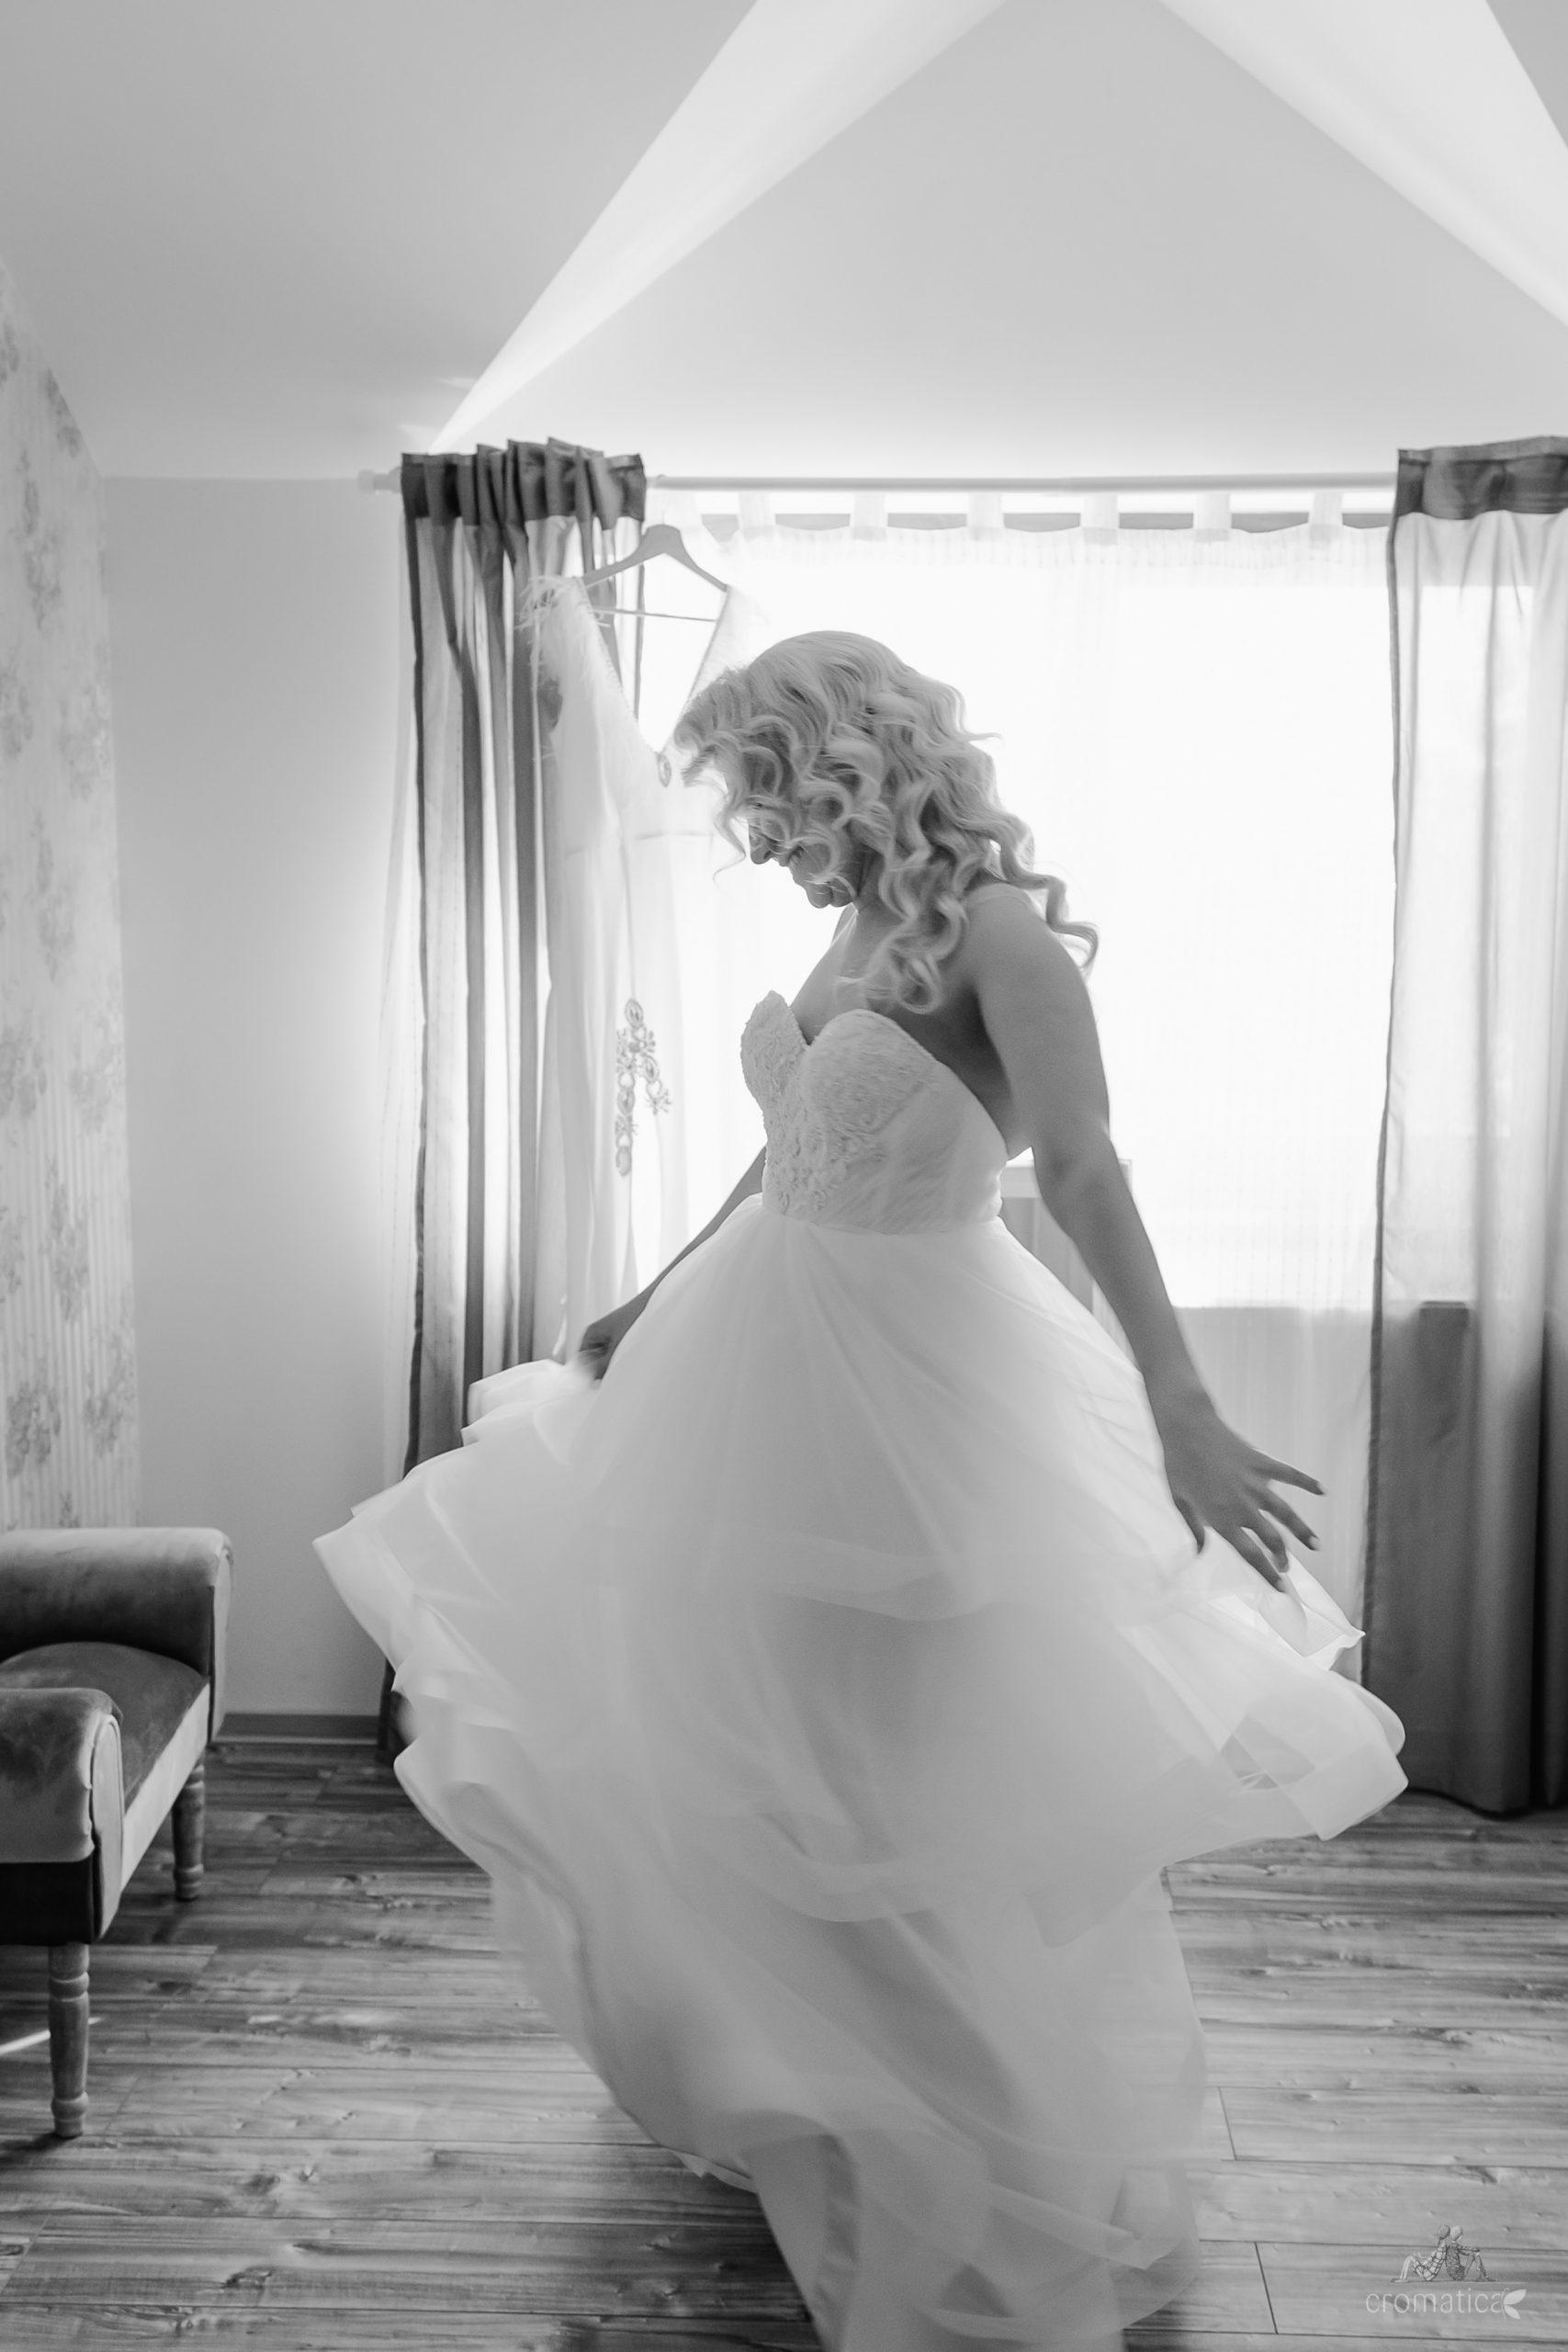 ana mihai fotografii nunta gradina lahovari 020